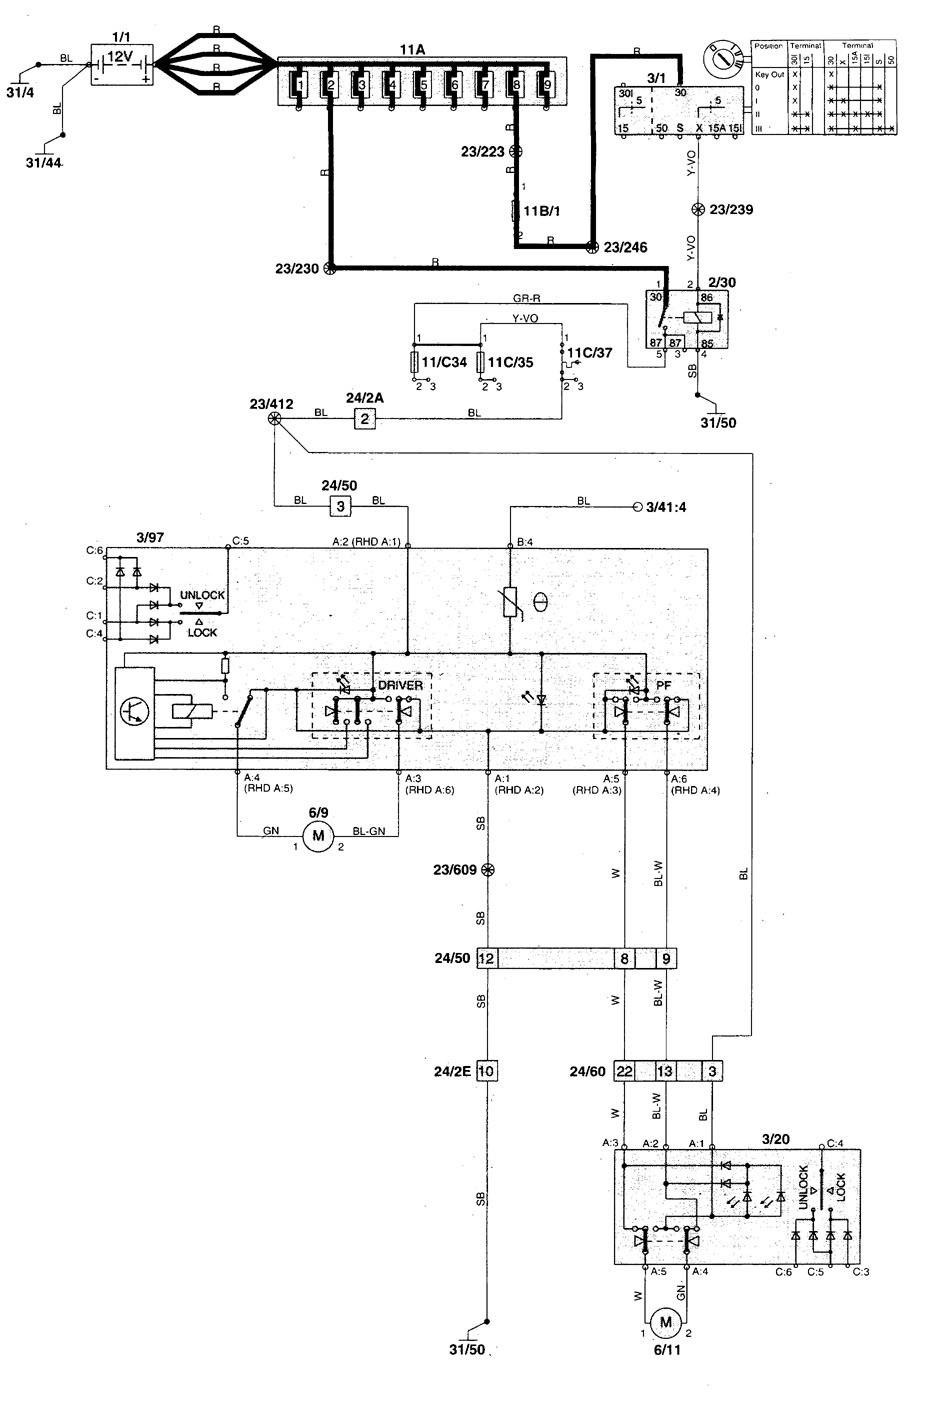 Terrific Volvo C70 Wiring Diagram General Wiring Diagram Data Wiring Cloud Biosomenaidewilluminateatxorg